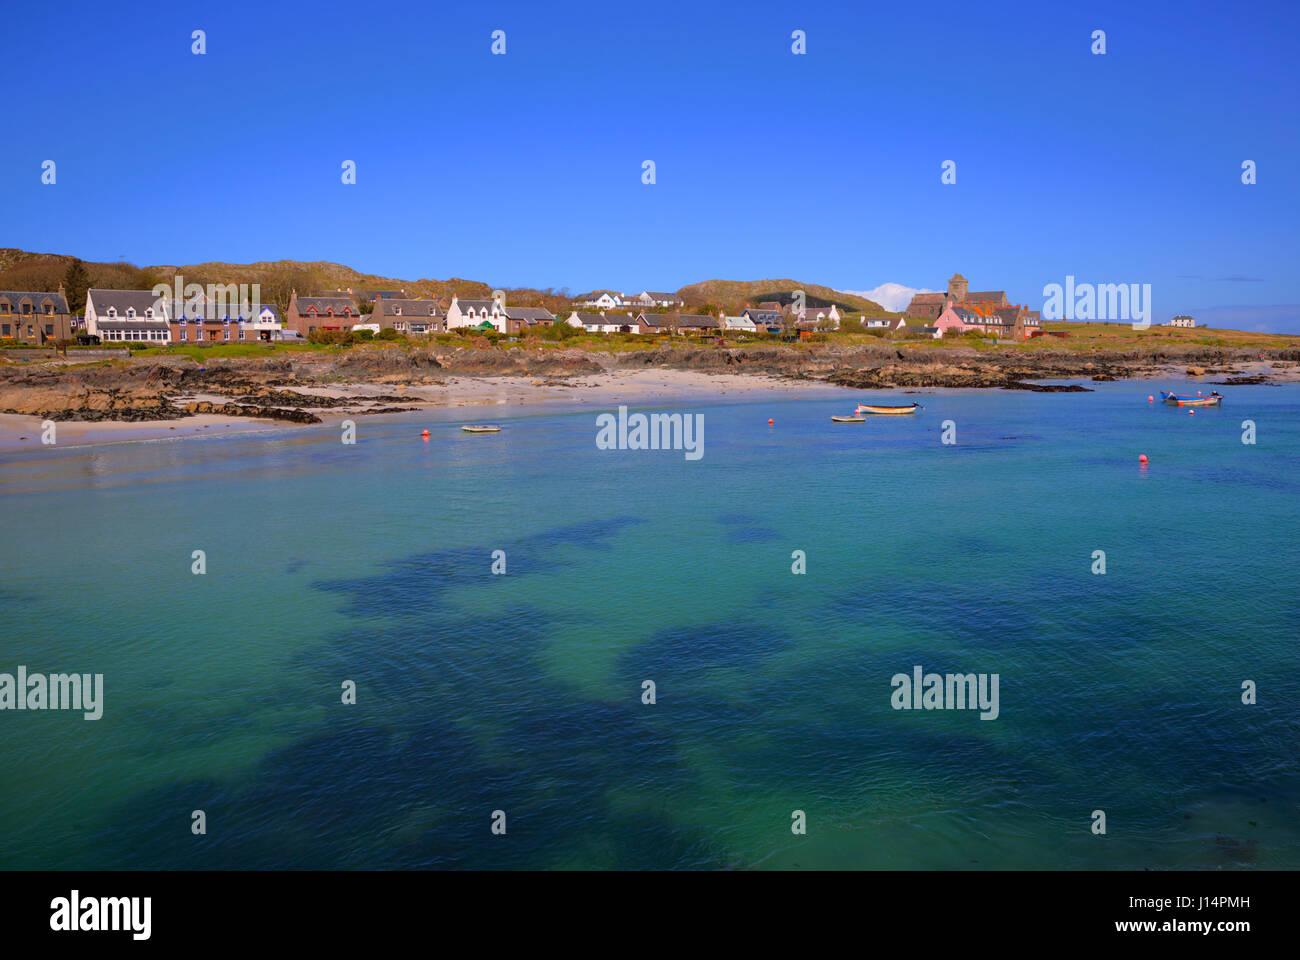 Turquoise clear blue sea Isle of Iona Scotland uk beautiful Scottish island - Stock Image